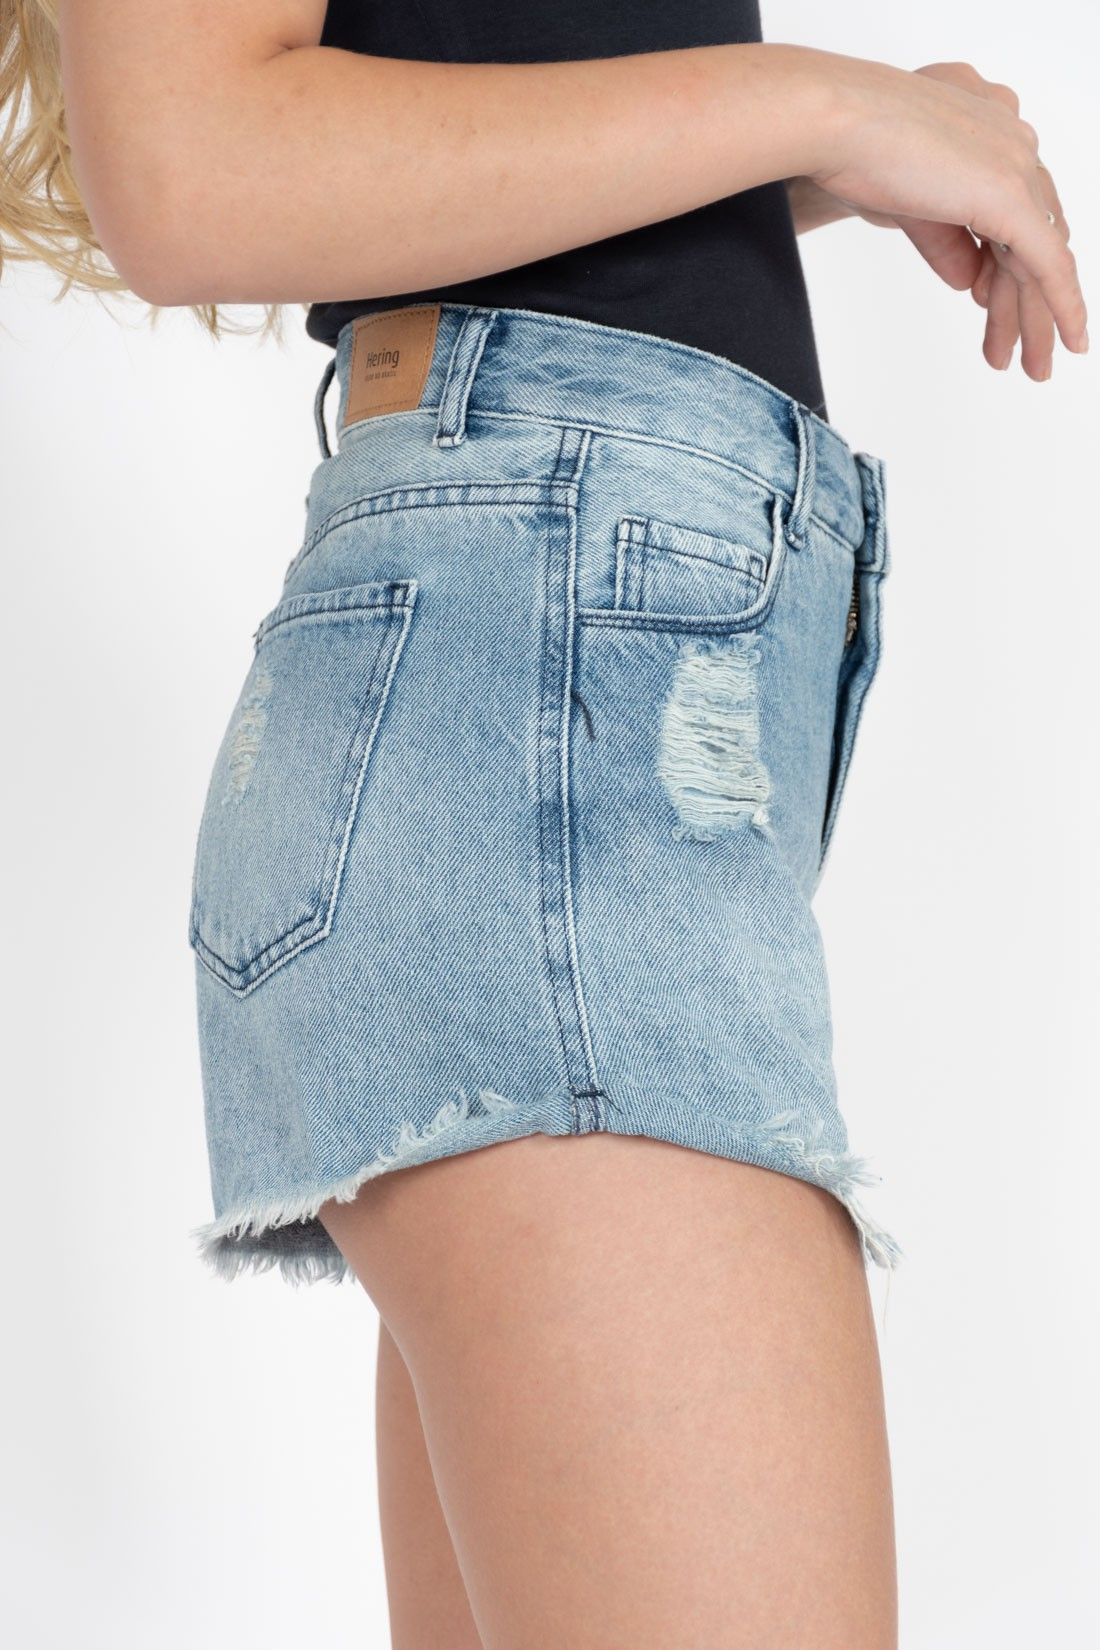 Shorts Jeans Hering Barra Desfiada